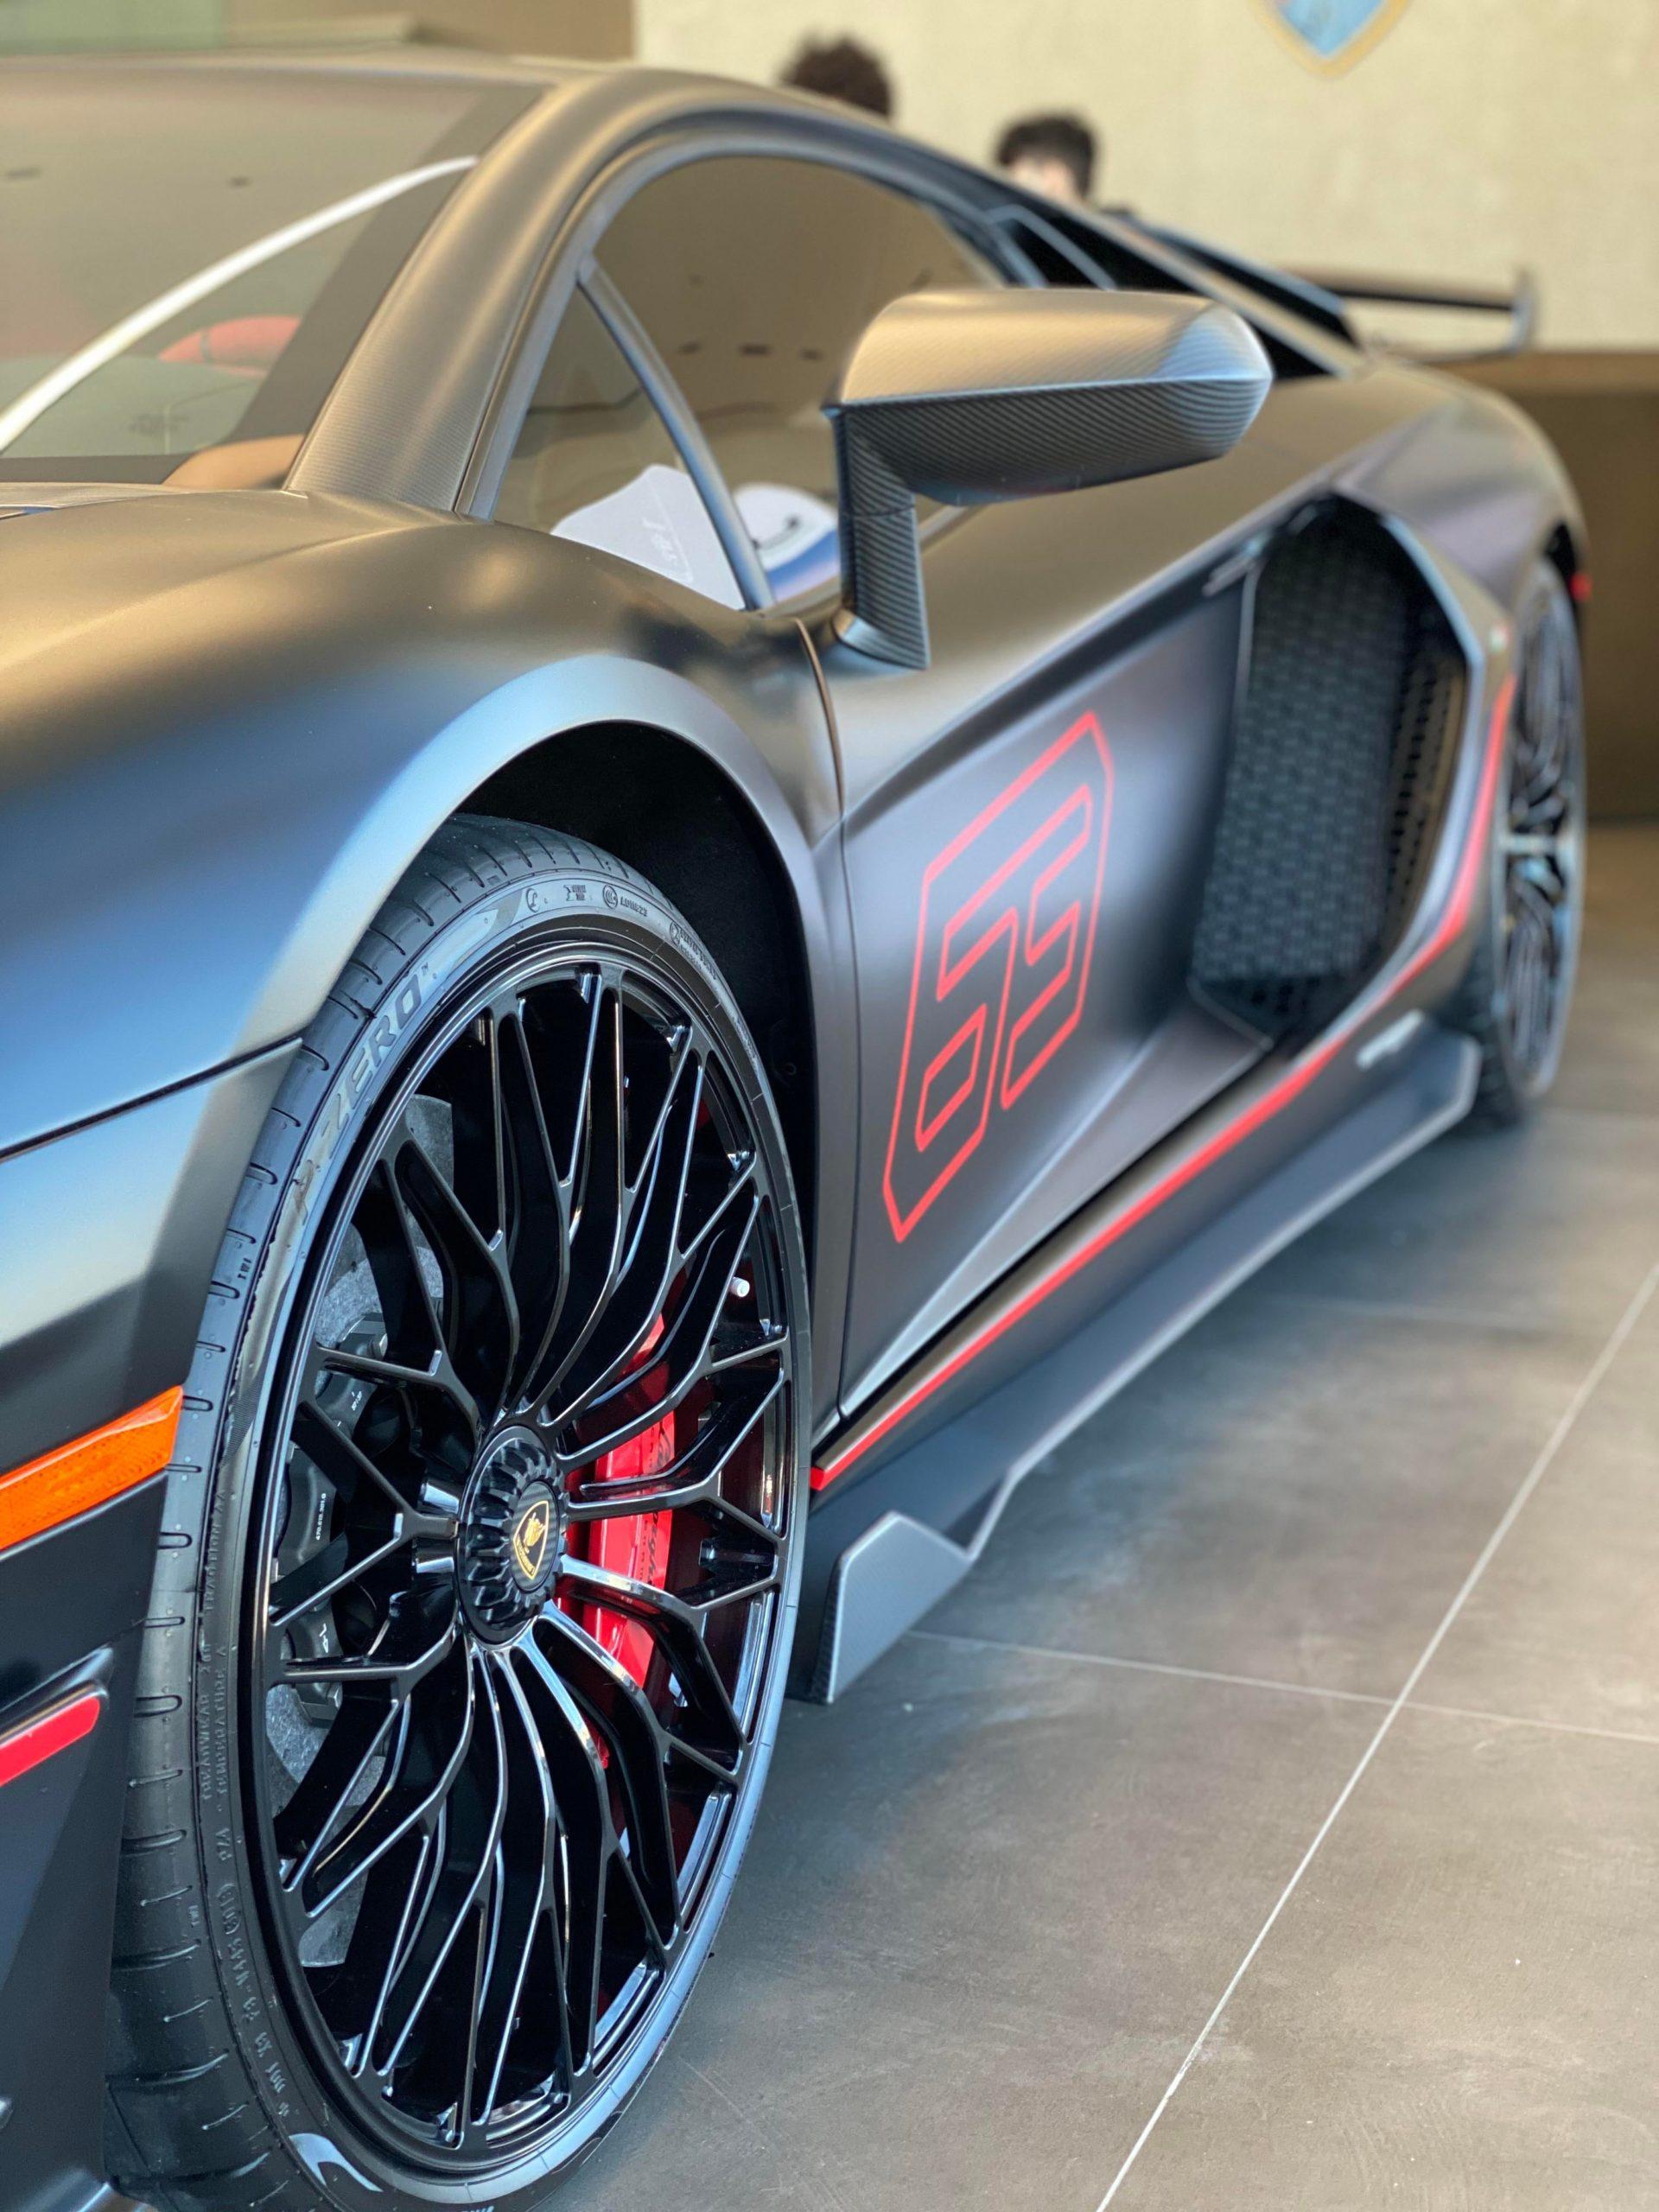 [OC] Lamborghini Aventador SVJ 63. This car is for sale at my local Lamborghini dealer.